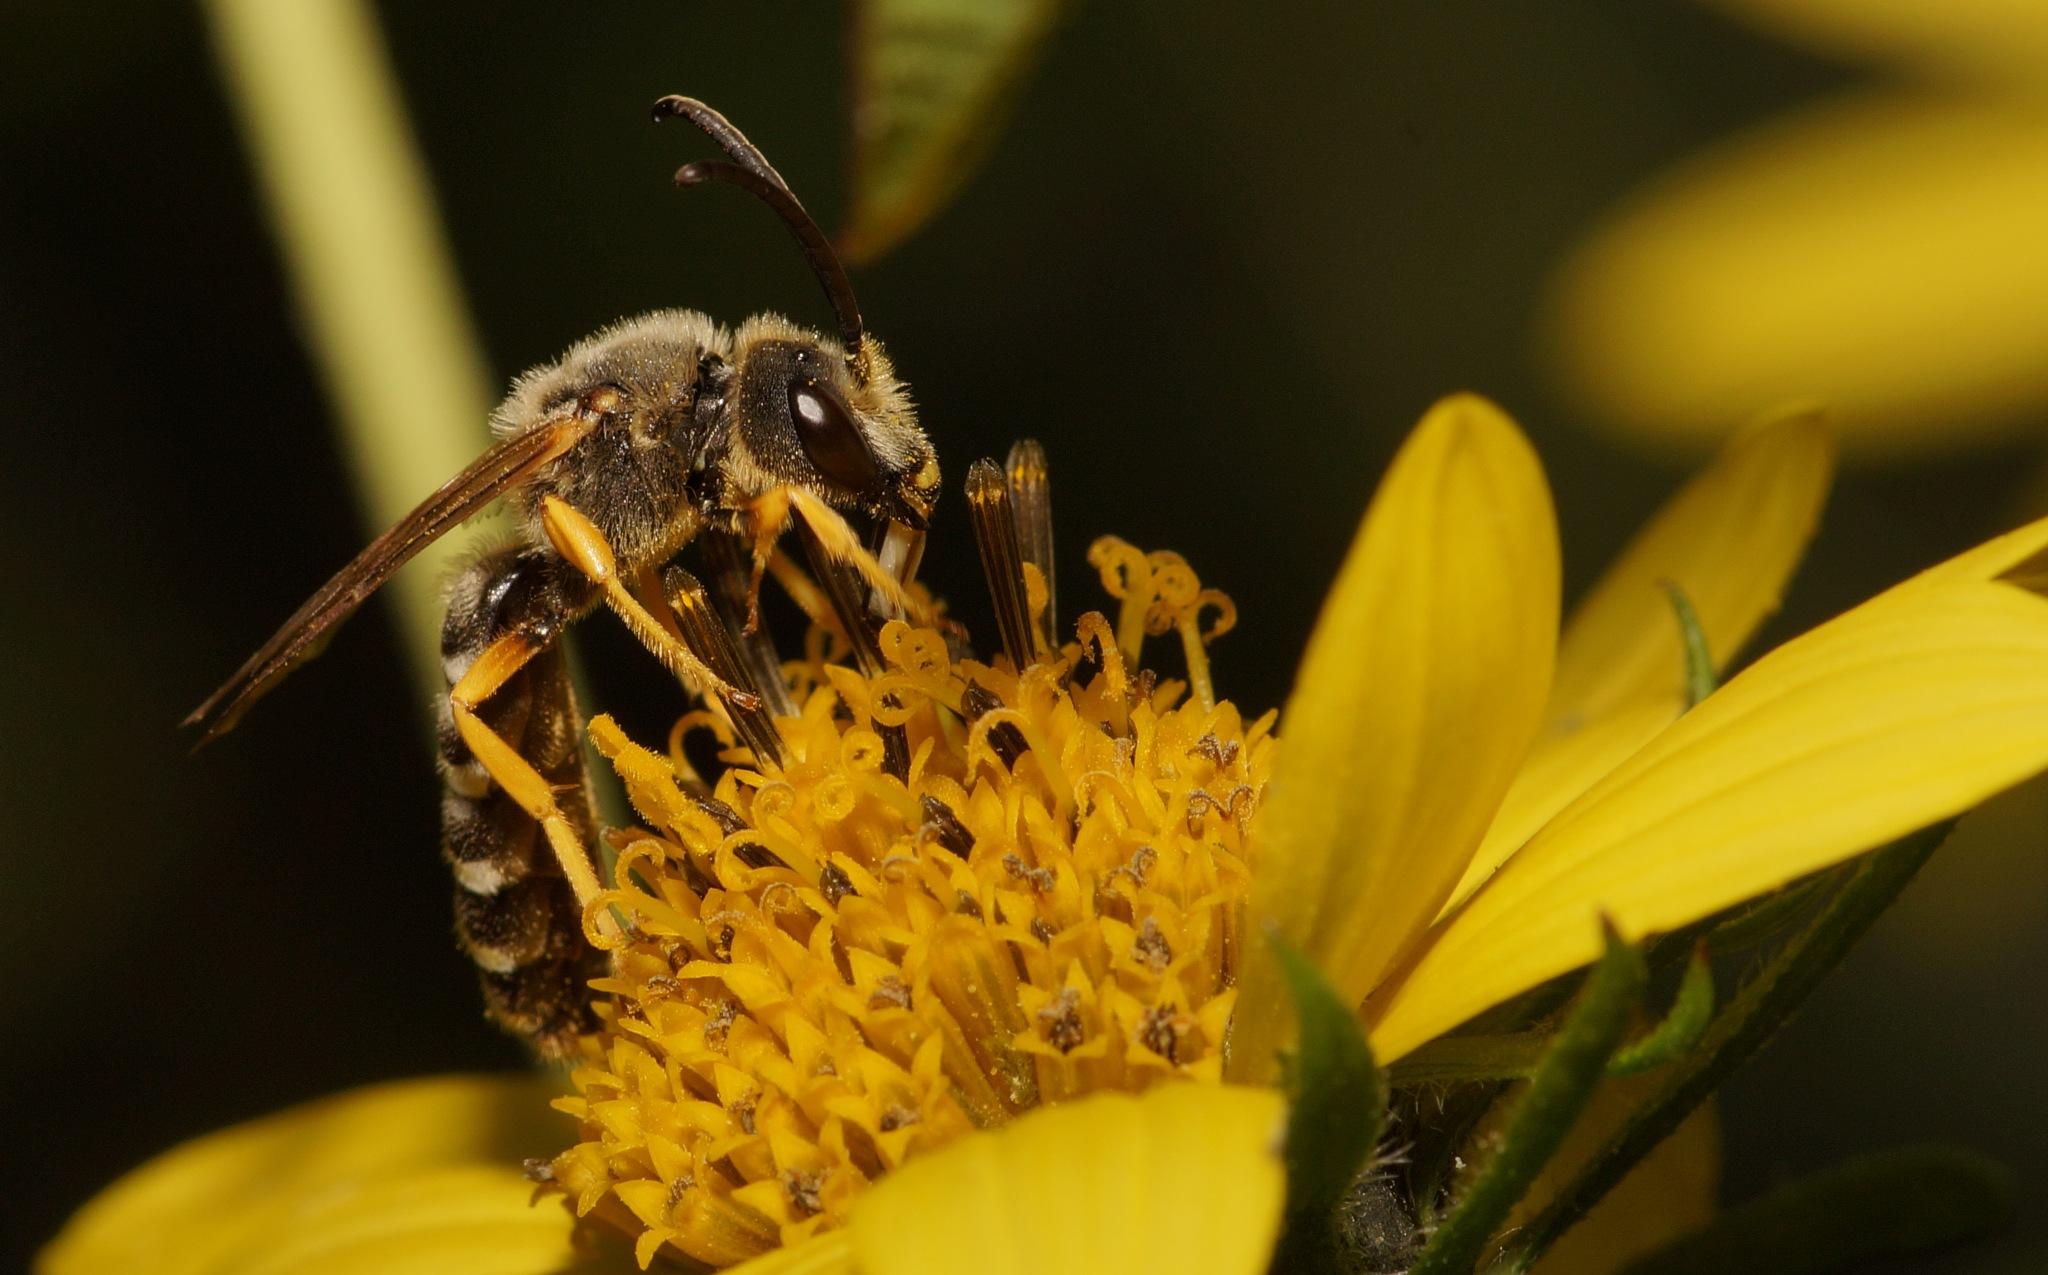 Bee on flower by Hintermann